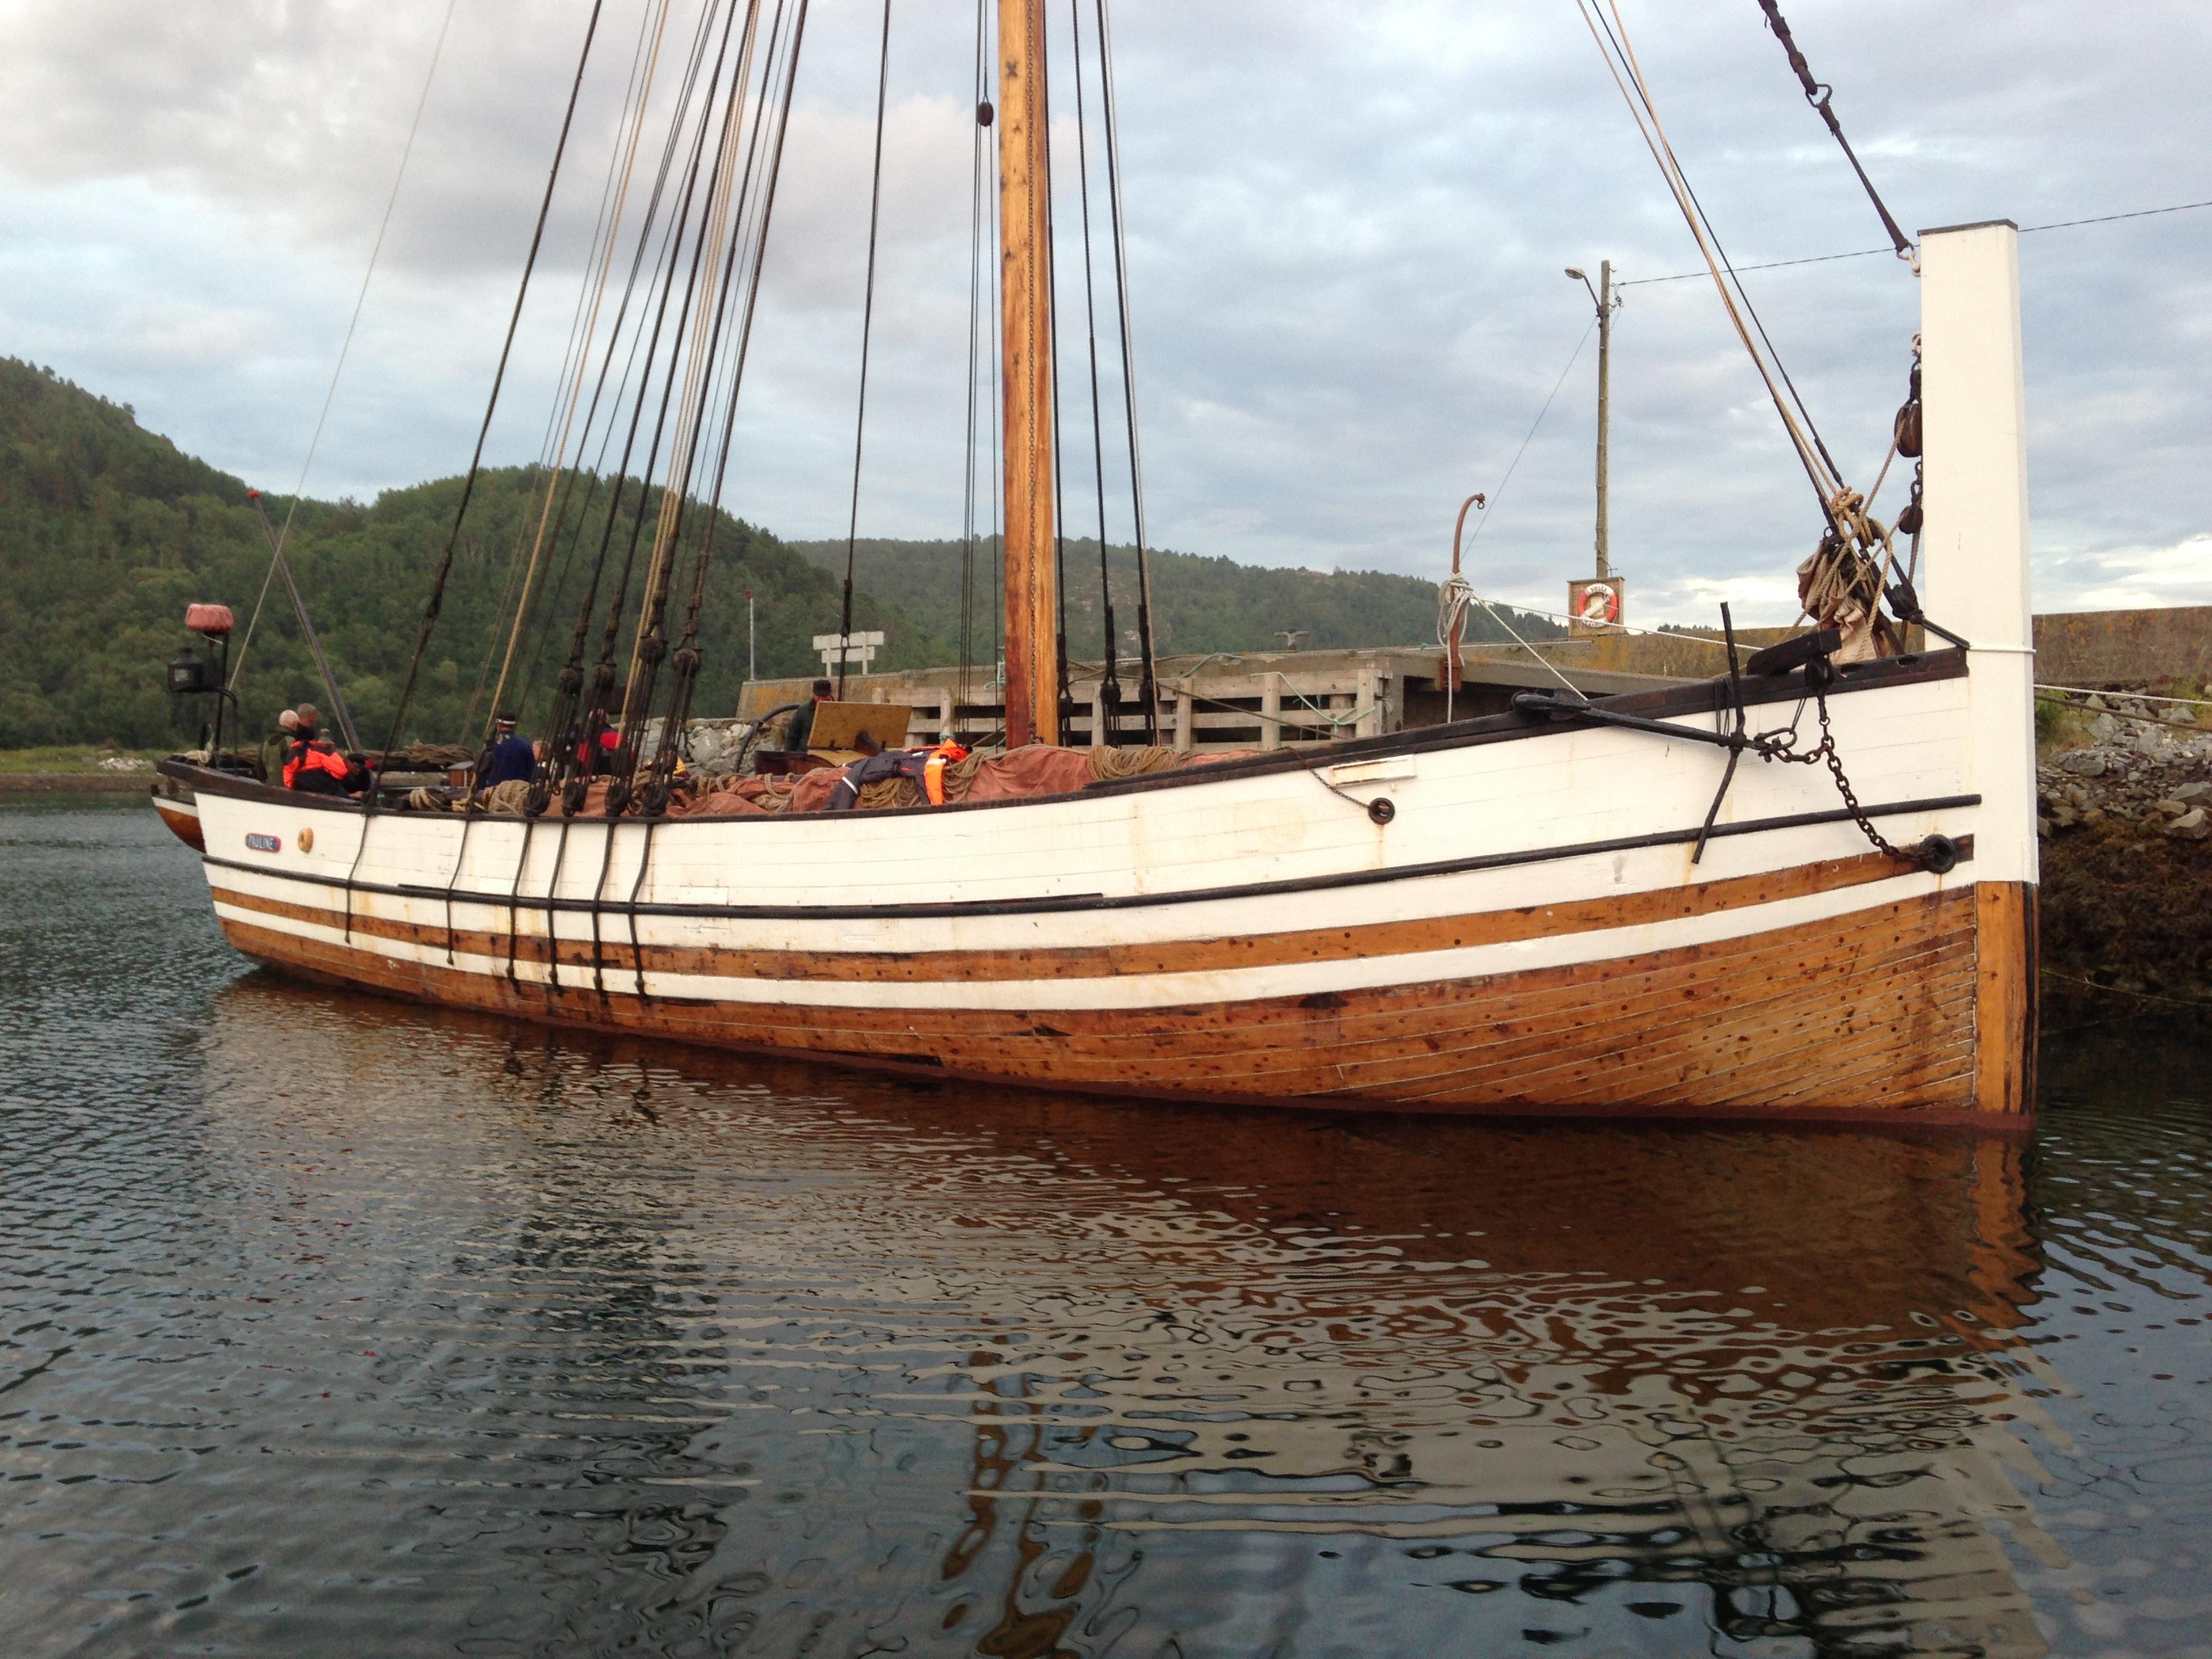 Sjursvika Båtforening